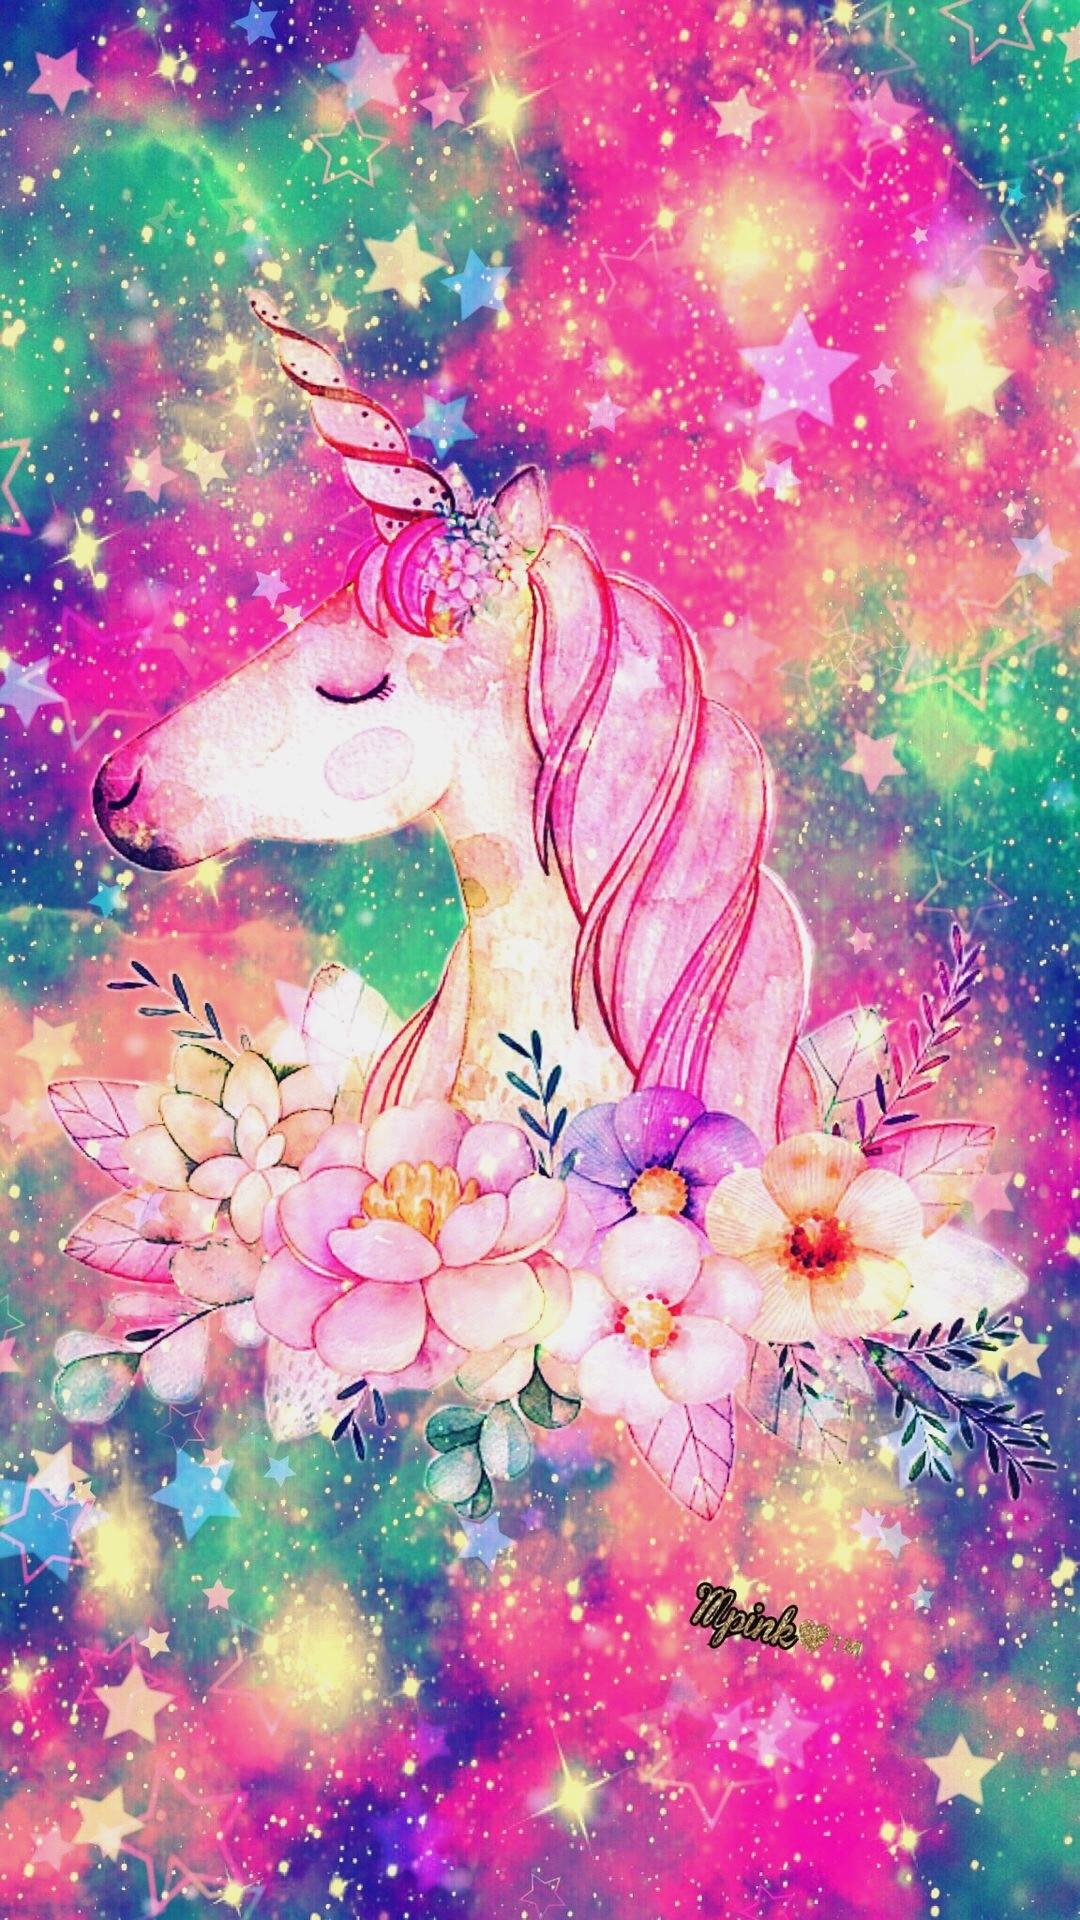 Super Duper Cute Wallpapers Pink Unicorn Wallpaper 54 Images